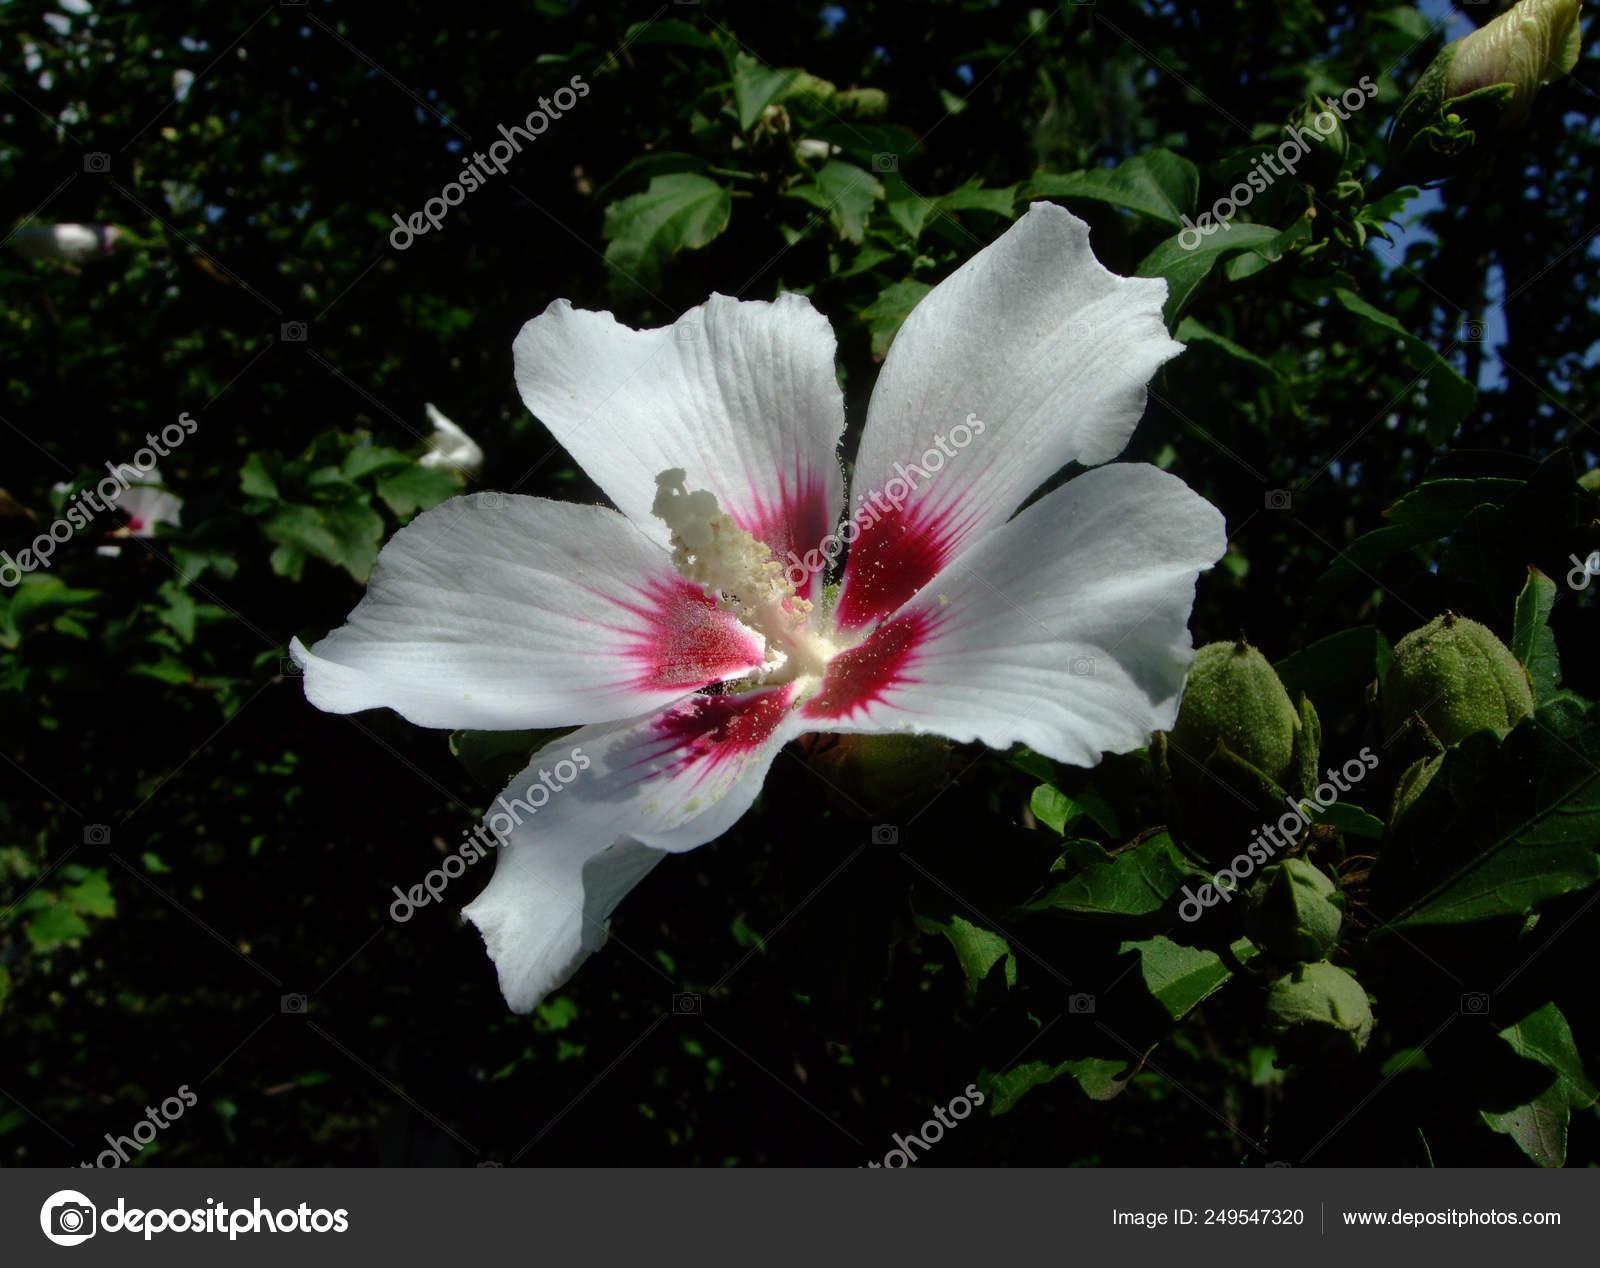 Hibiscus Flower In The Garden Detail Of The Stamen Stock Photo